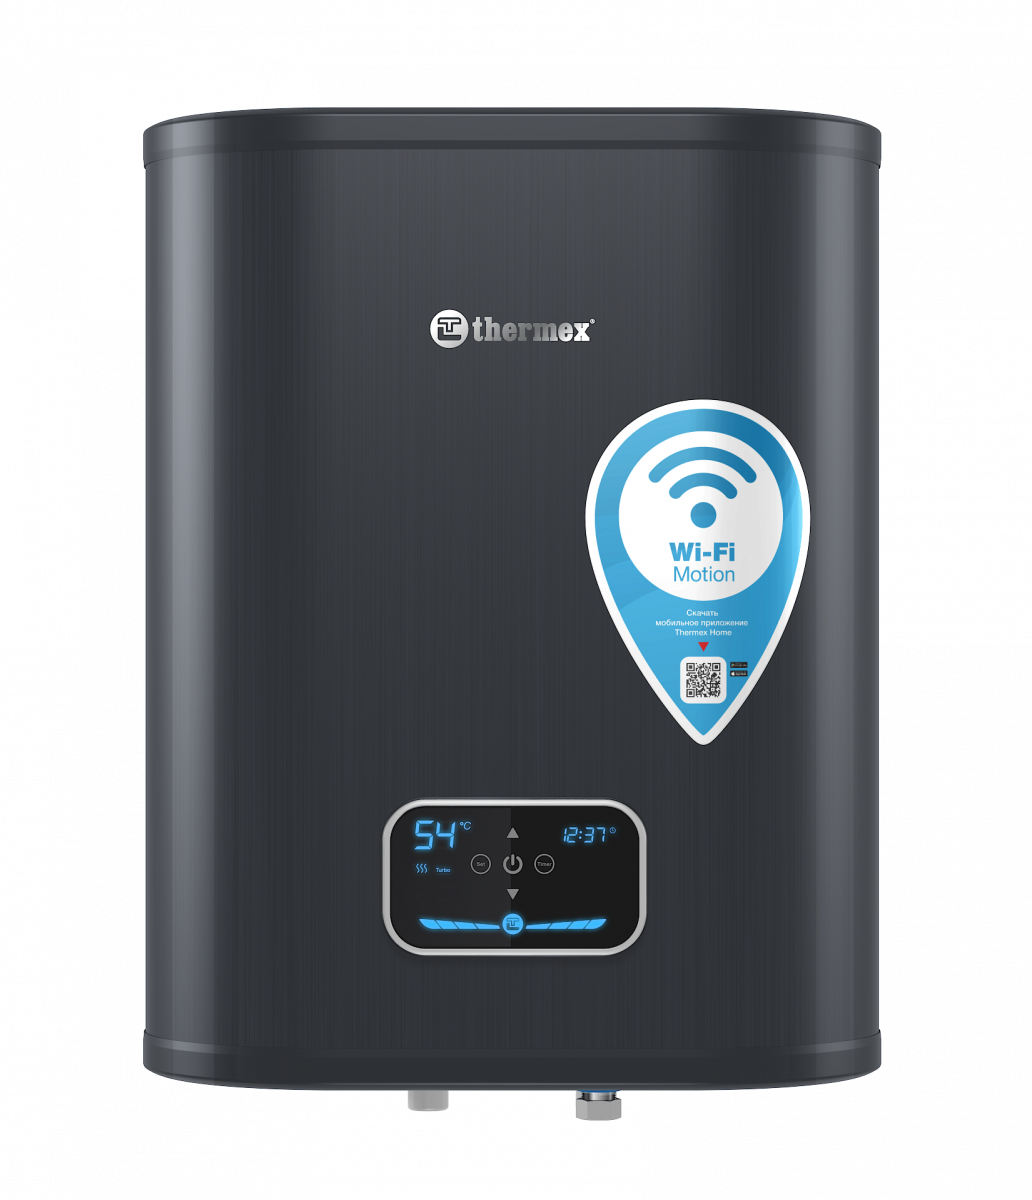 Водонагреватель THERMEX ID 50 V (pro) Wi-Fi